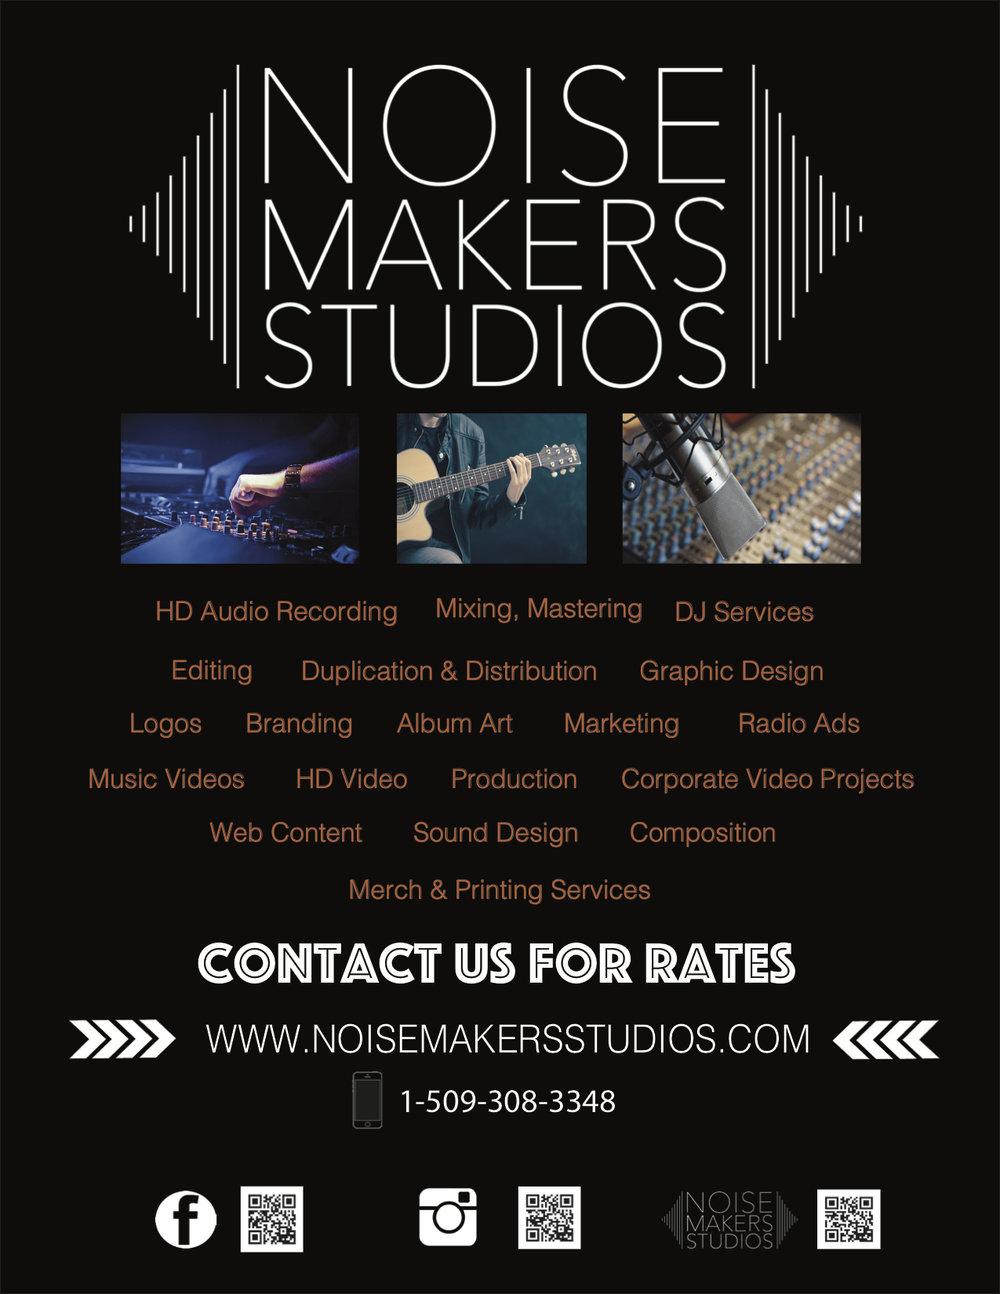 Noise Makers Studios flyer.jpg